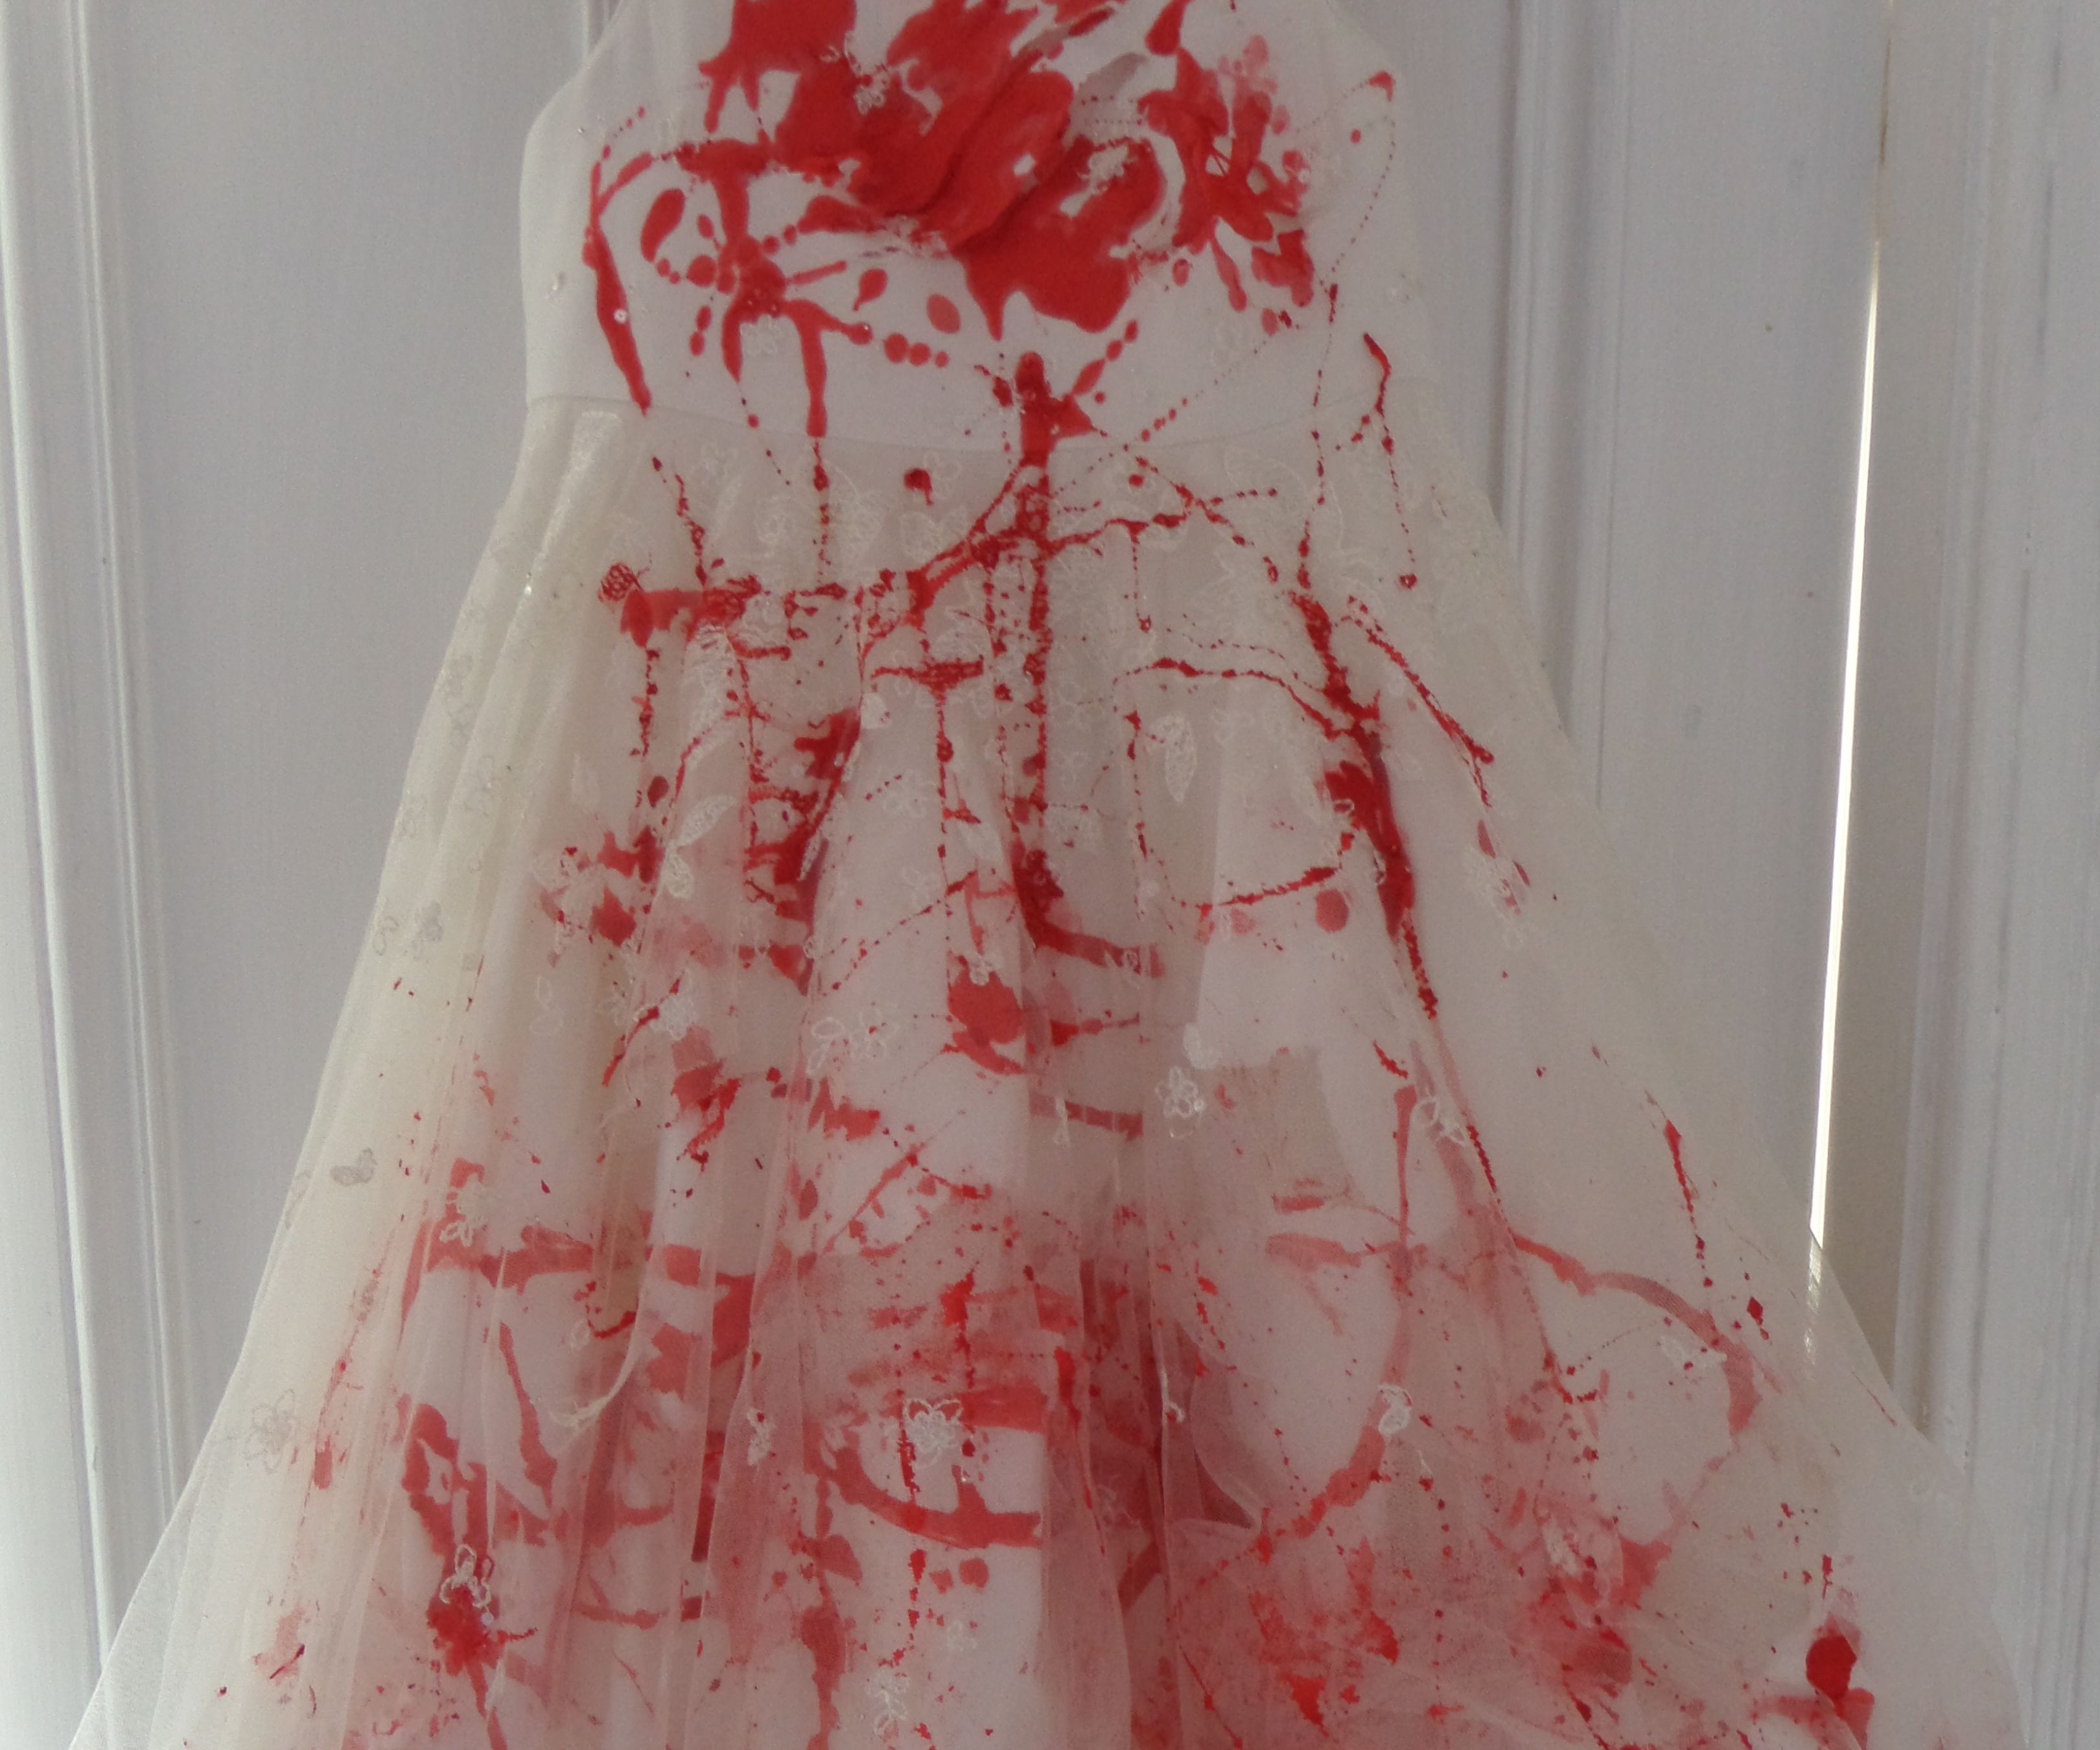 Bloody Dress-decor/costume